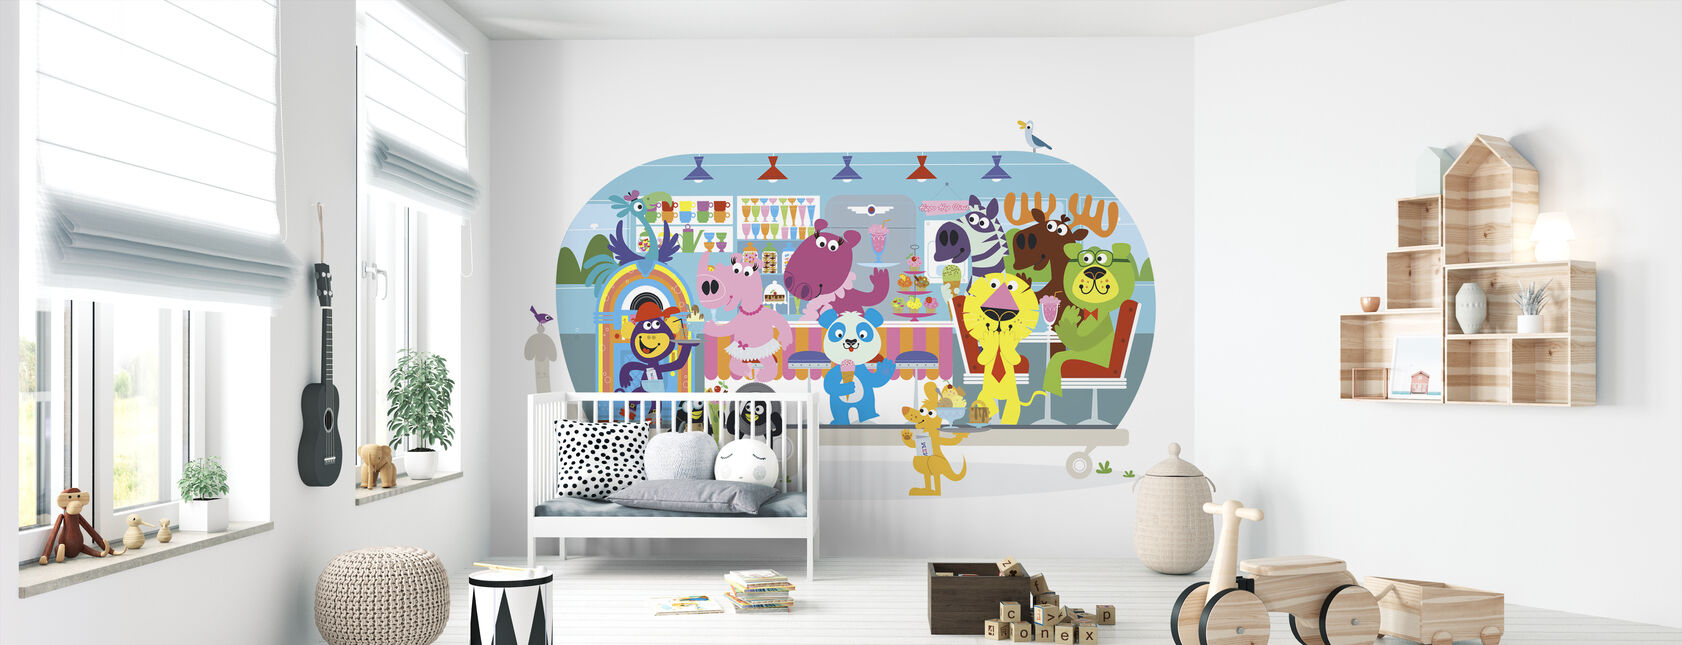 Hauskan rakastava Betsys Hippo Hop Diner - Tapetti - Vauvan huone